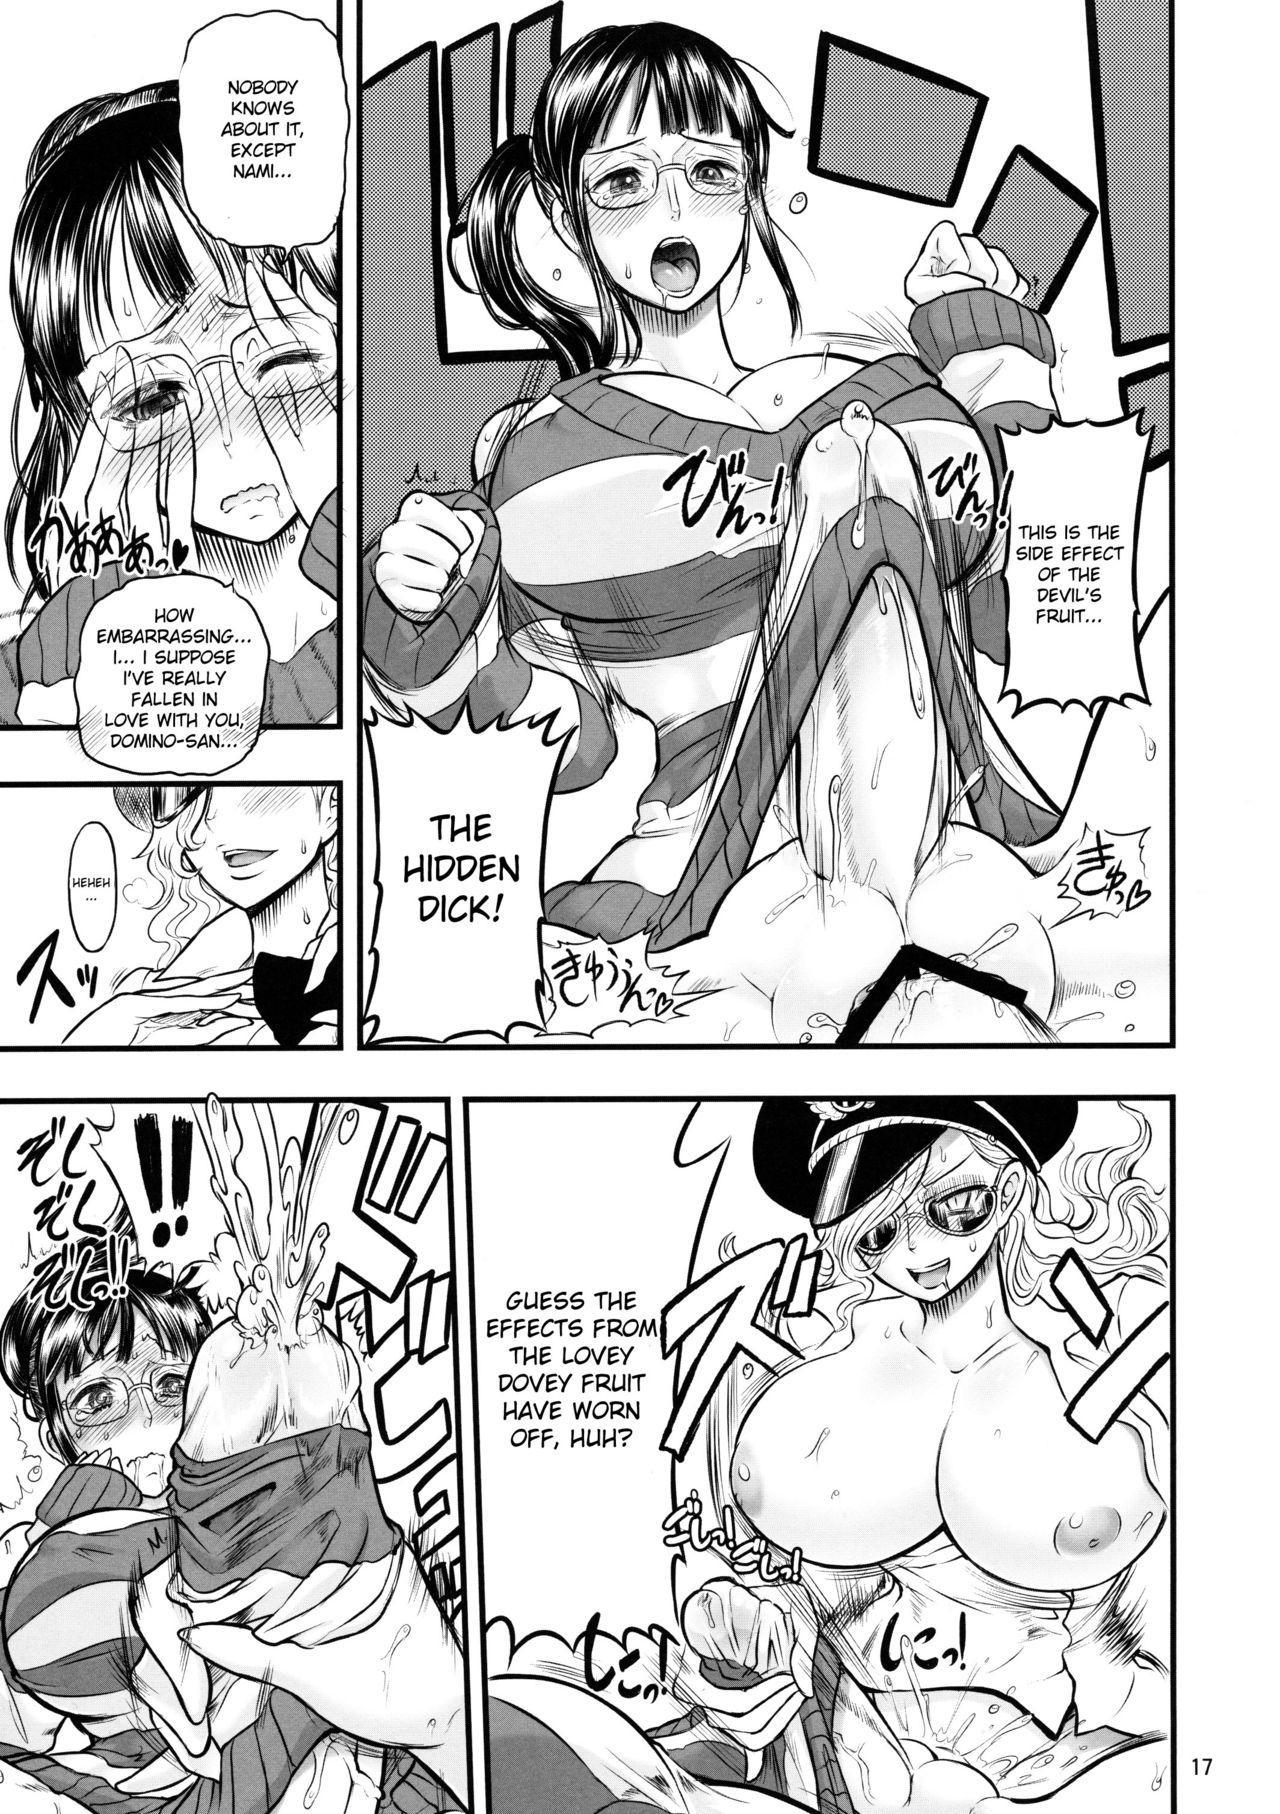 Midare Saki Joshuu Kaizoku Soushuuhen   Bloom, Pirate Hooker! Bloom! Annual 17